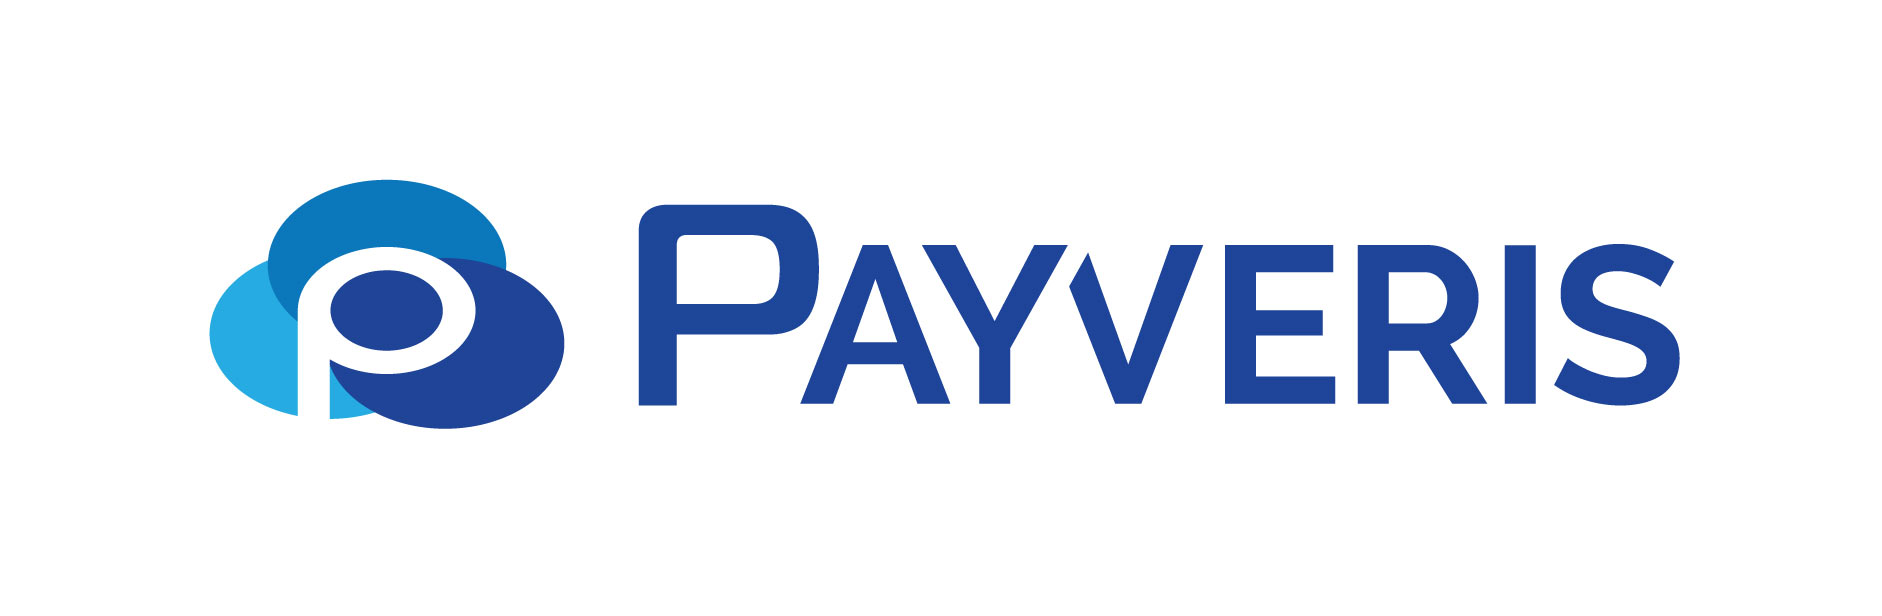 Payveris-Logo-Horiz-FullColor-RGB-WhiteBack-1882x616